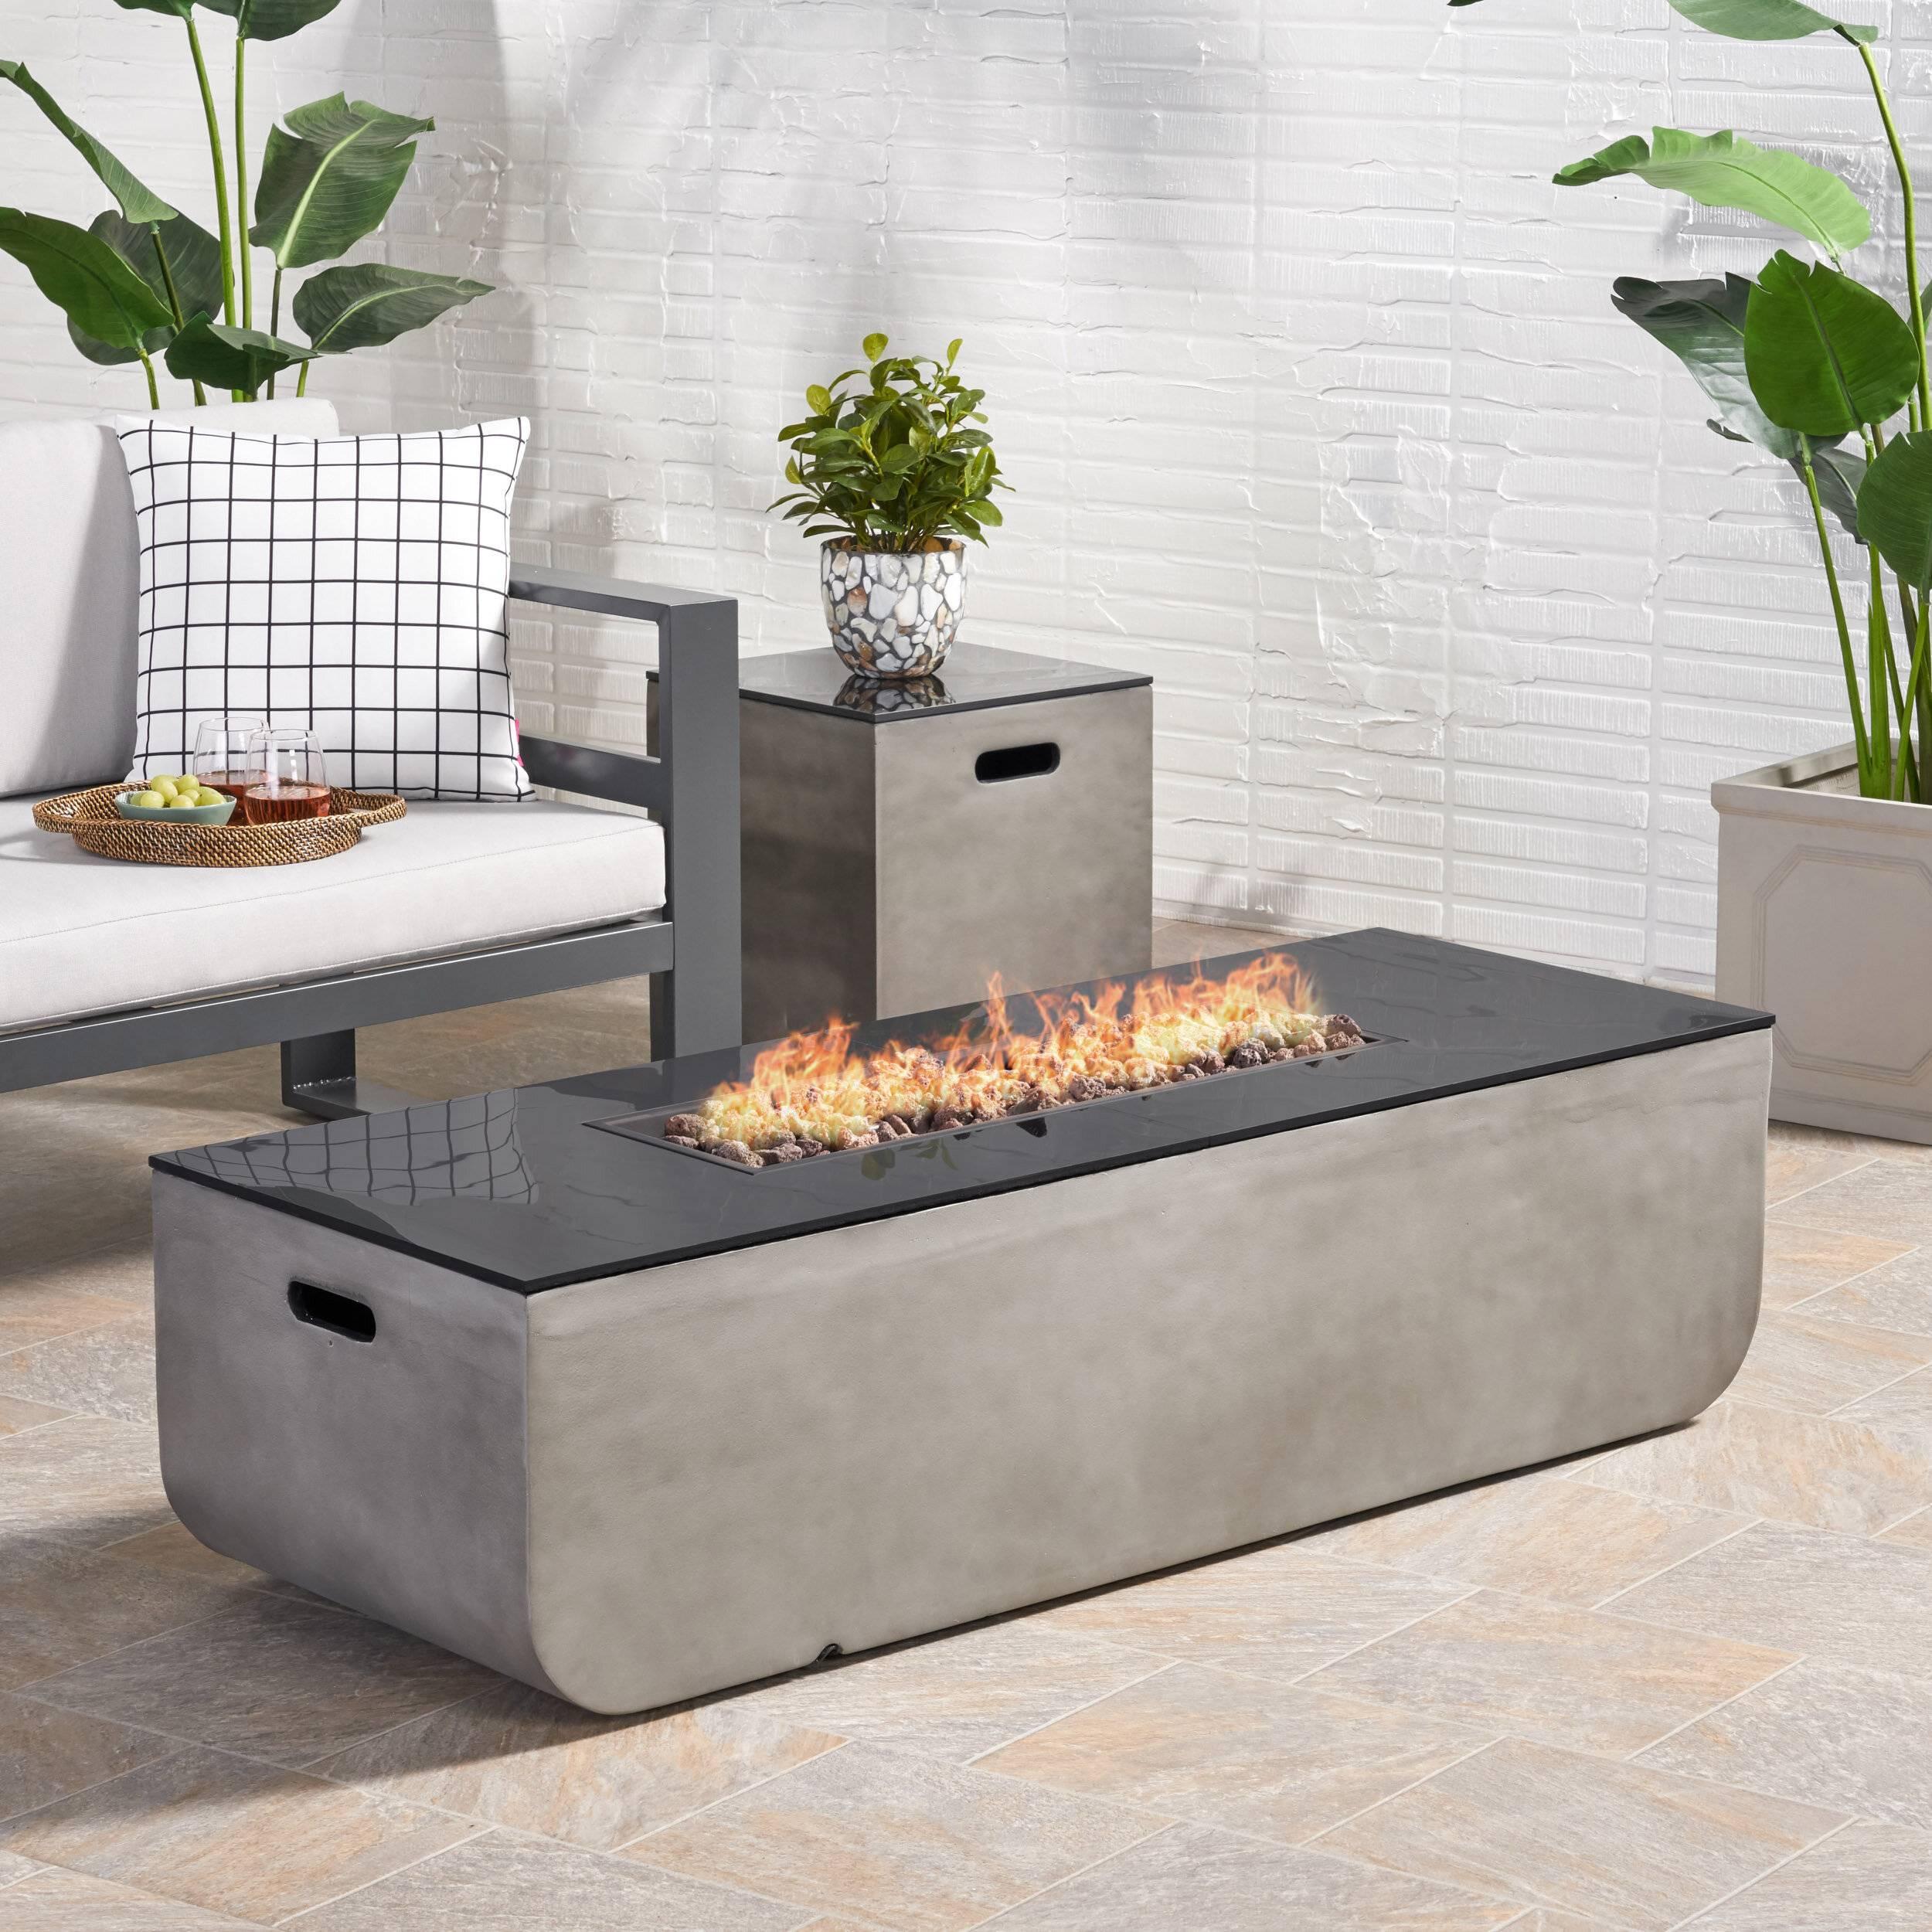 Modern Contemporary Glass Top Fire Table Backyard Patio